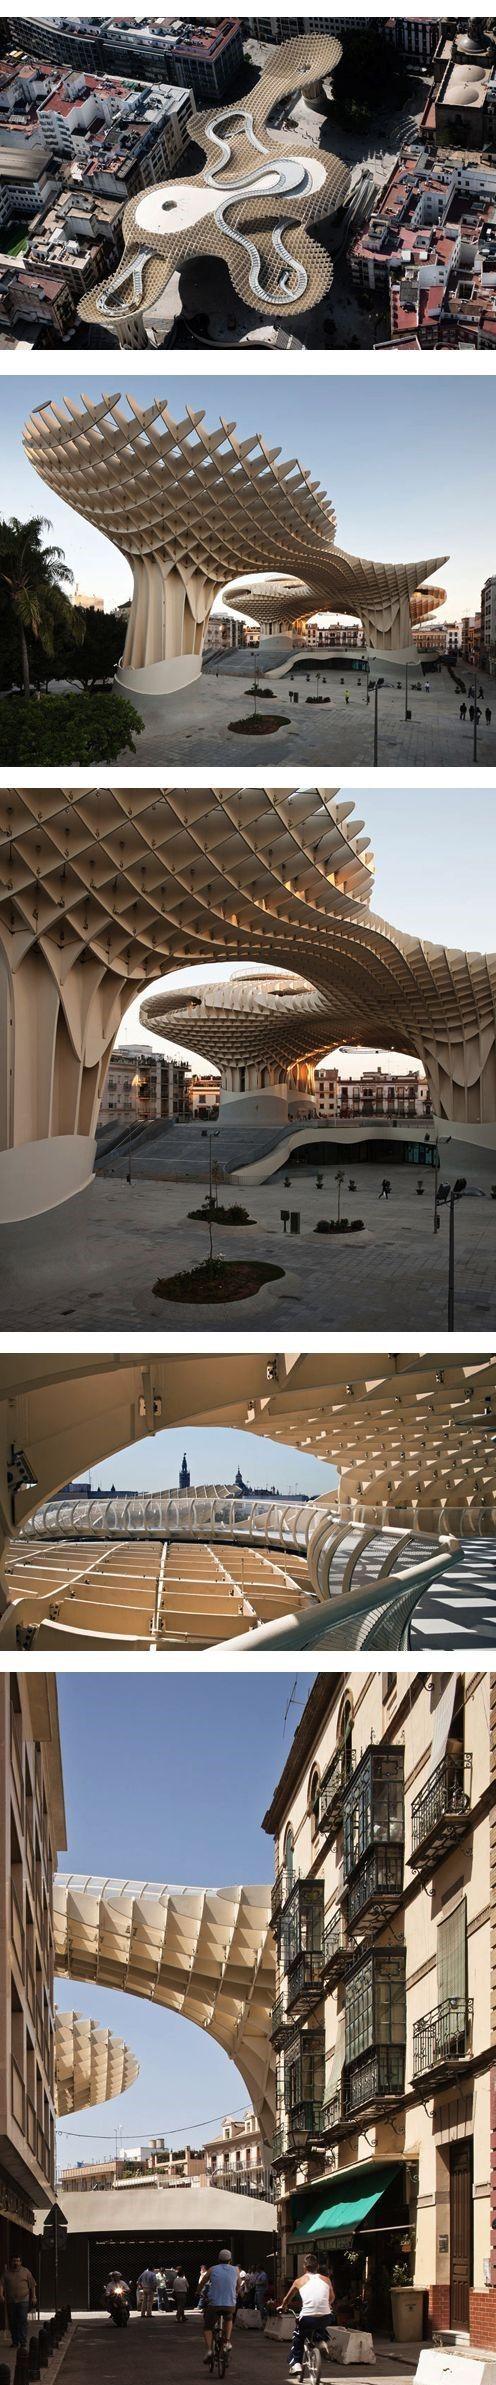 Redevelopment of the Plaza de la Encarnacion, Metropol Parasol | j. mayer h. architects